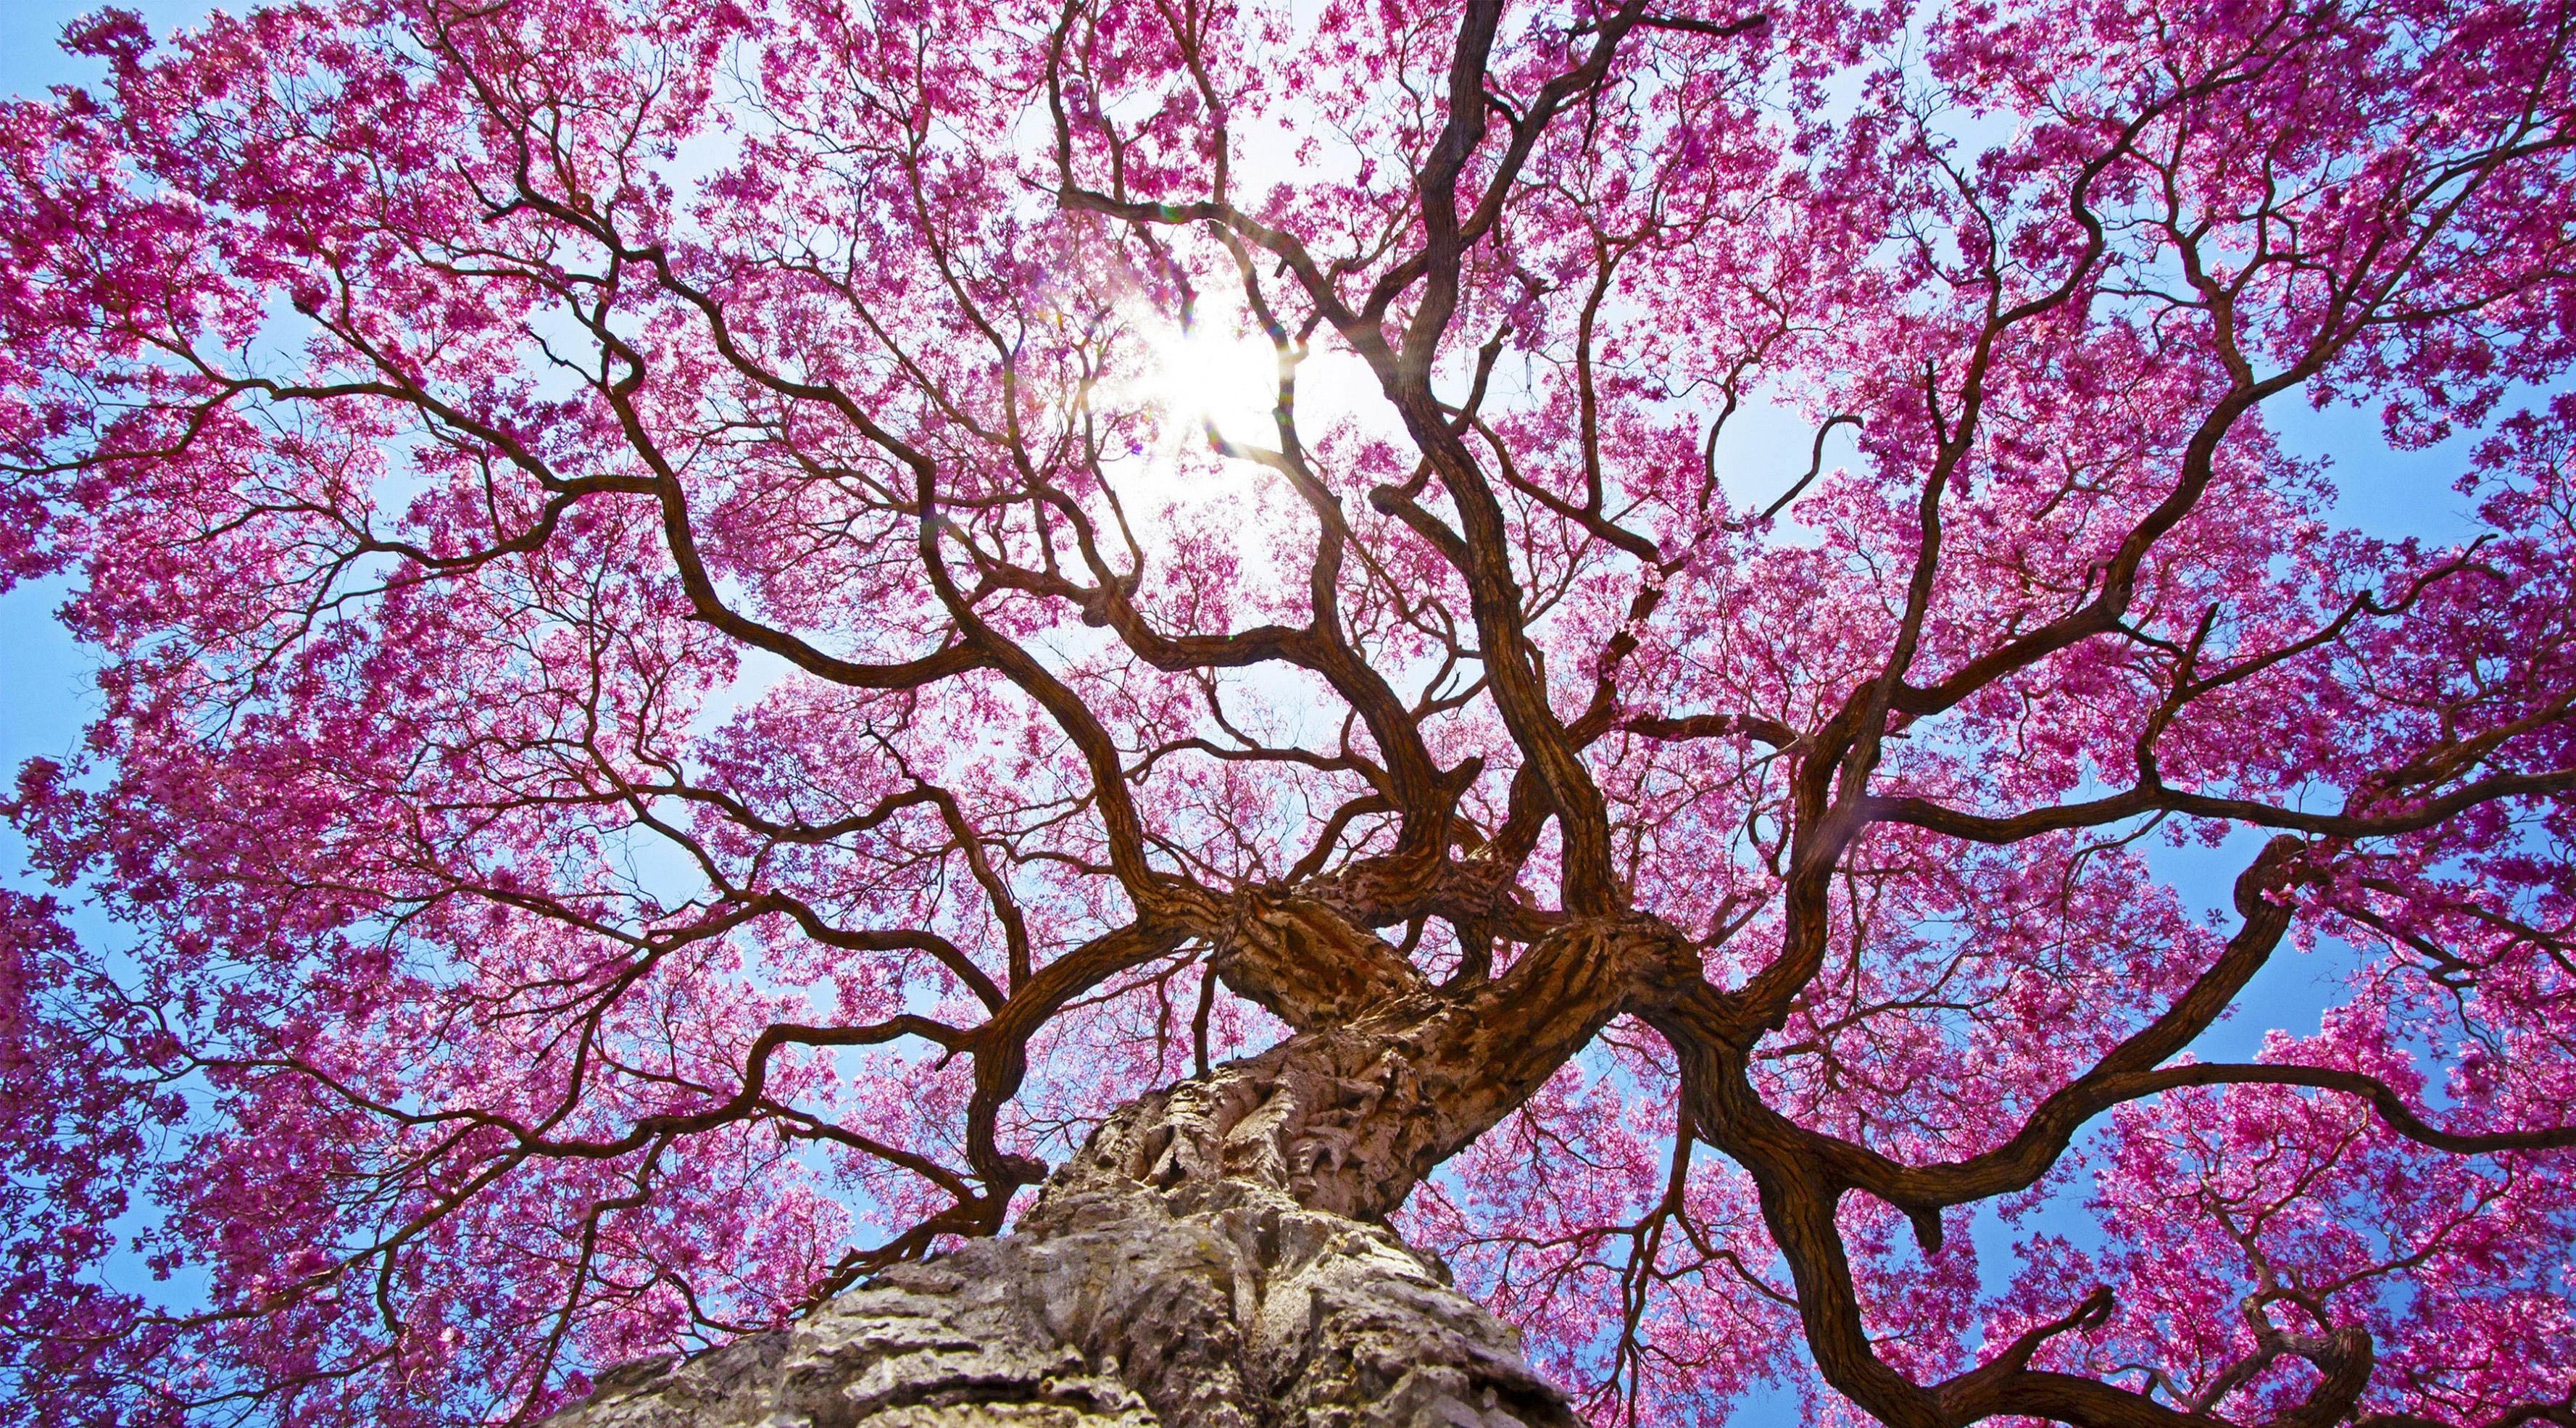 Pink tree 4k hd nature 4k wallpapers images - Pink wallpaper 4k ...